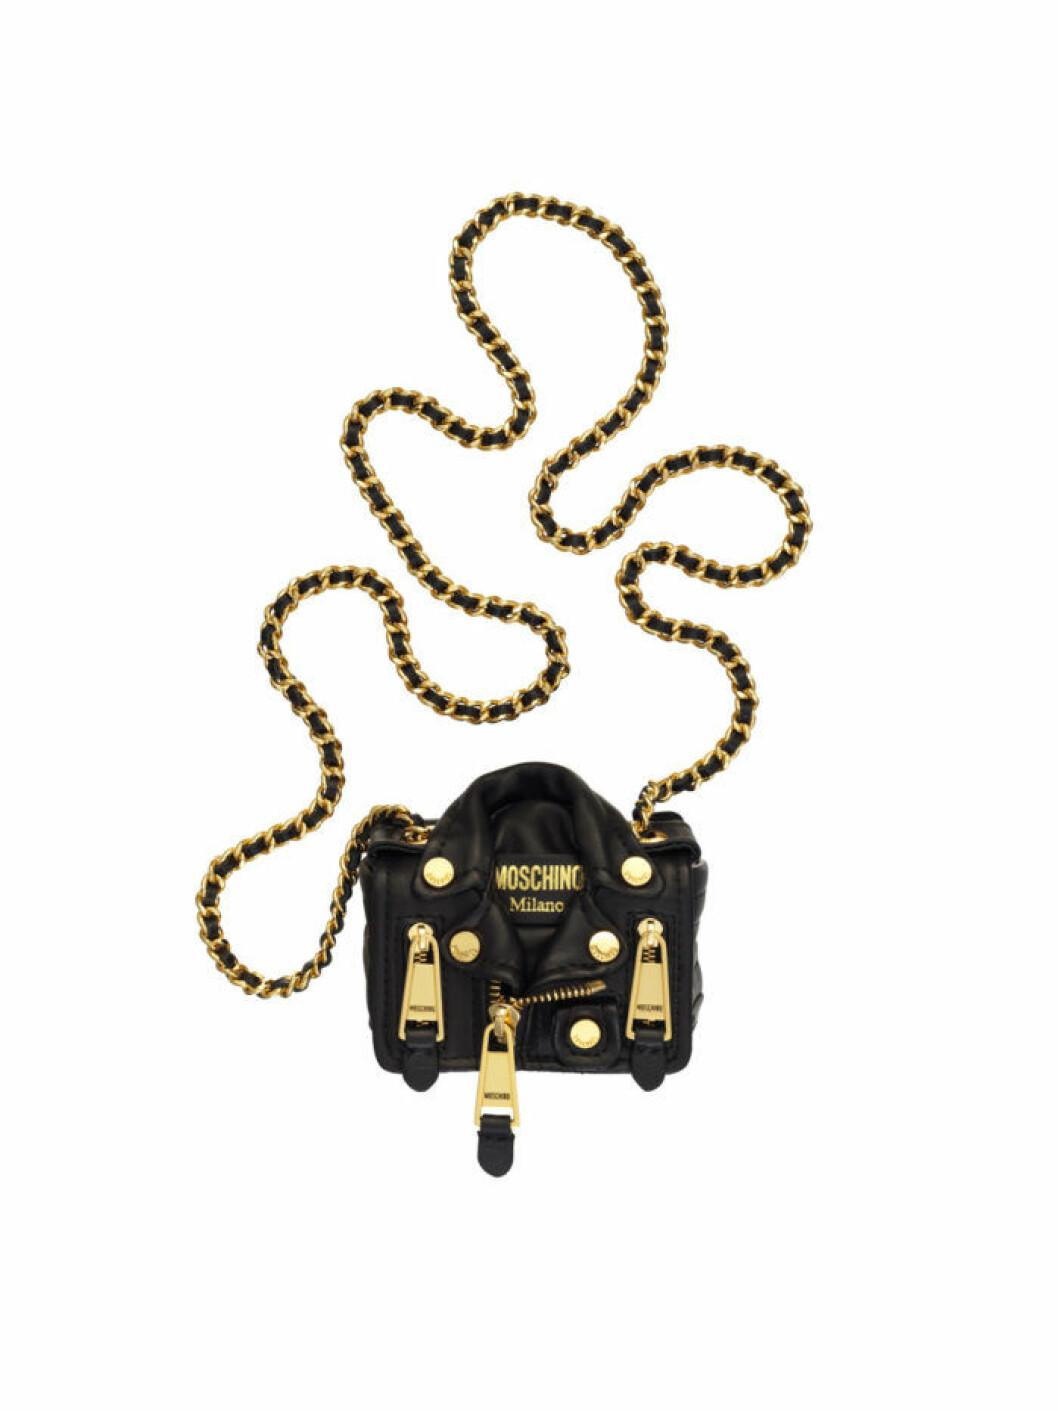 Moschinos ikoniska skinnjackeväska i miniatyr Moschino [tv] H&M